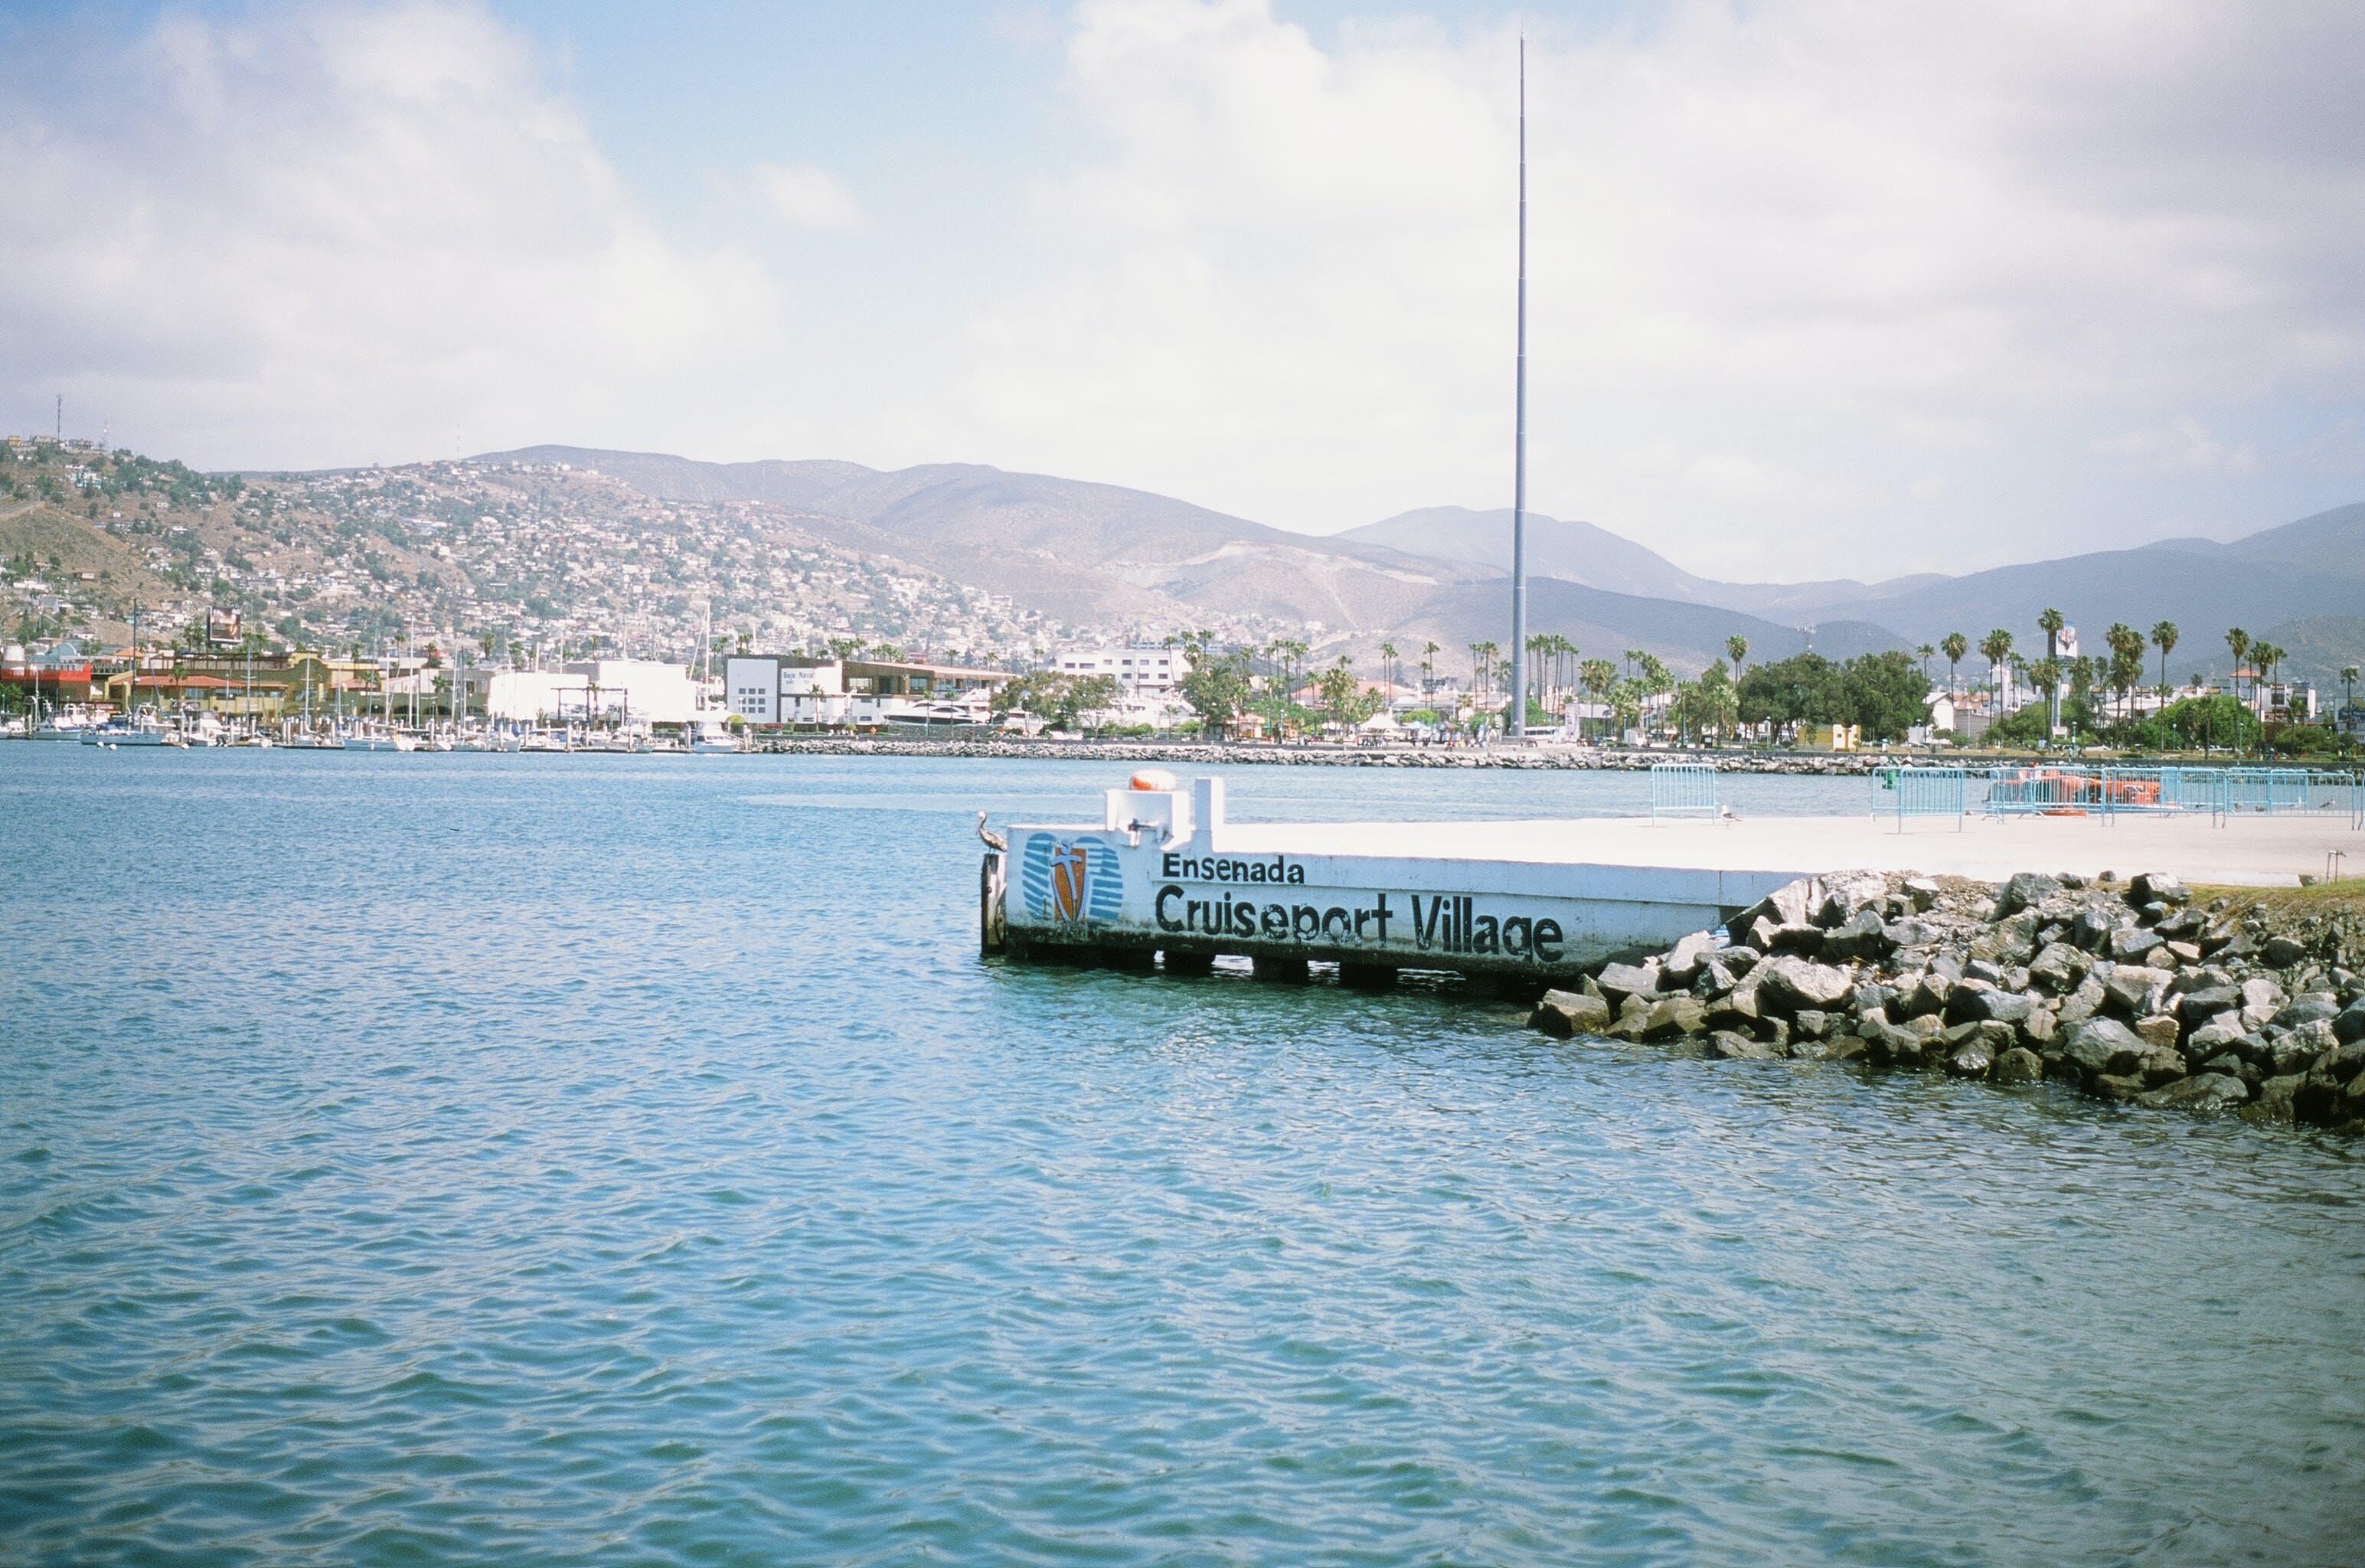 Docking Pier Beside Body of Waster